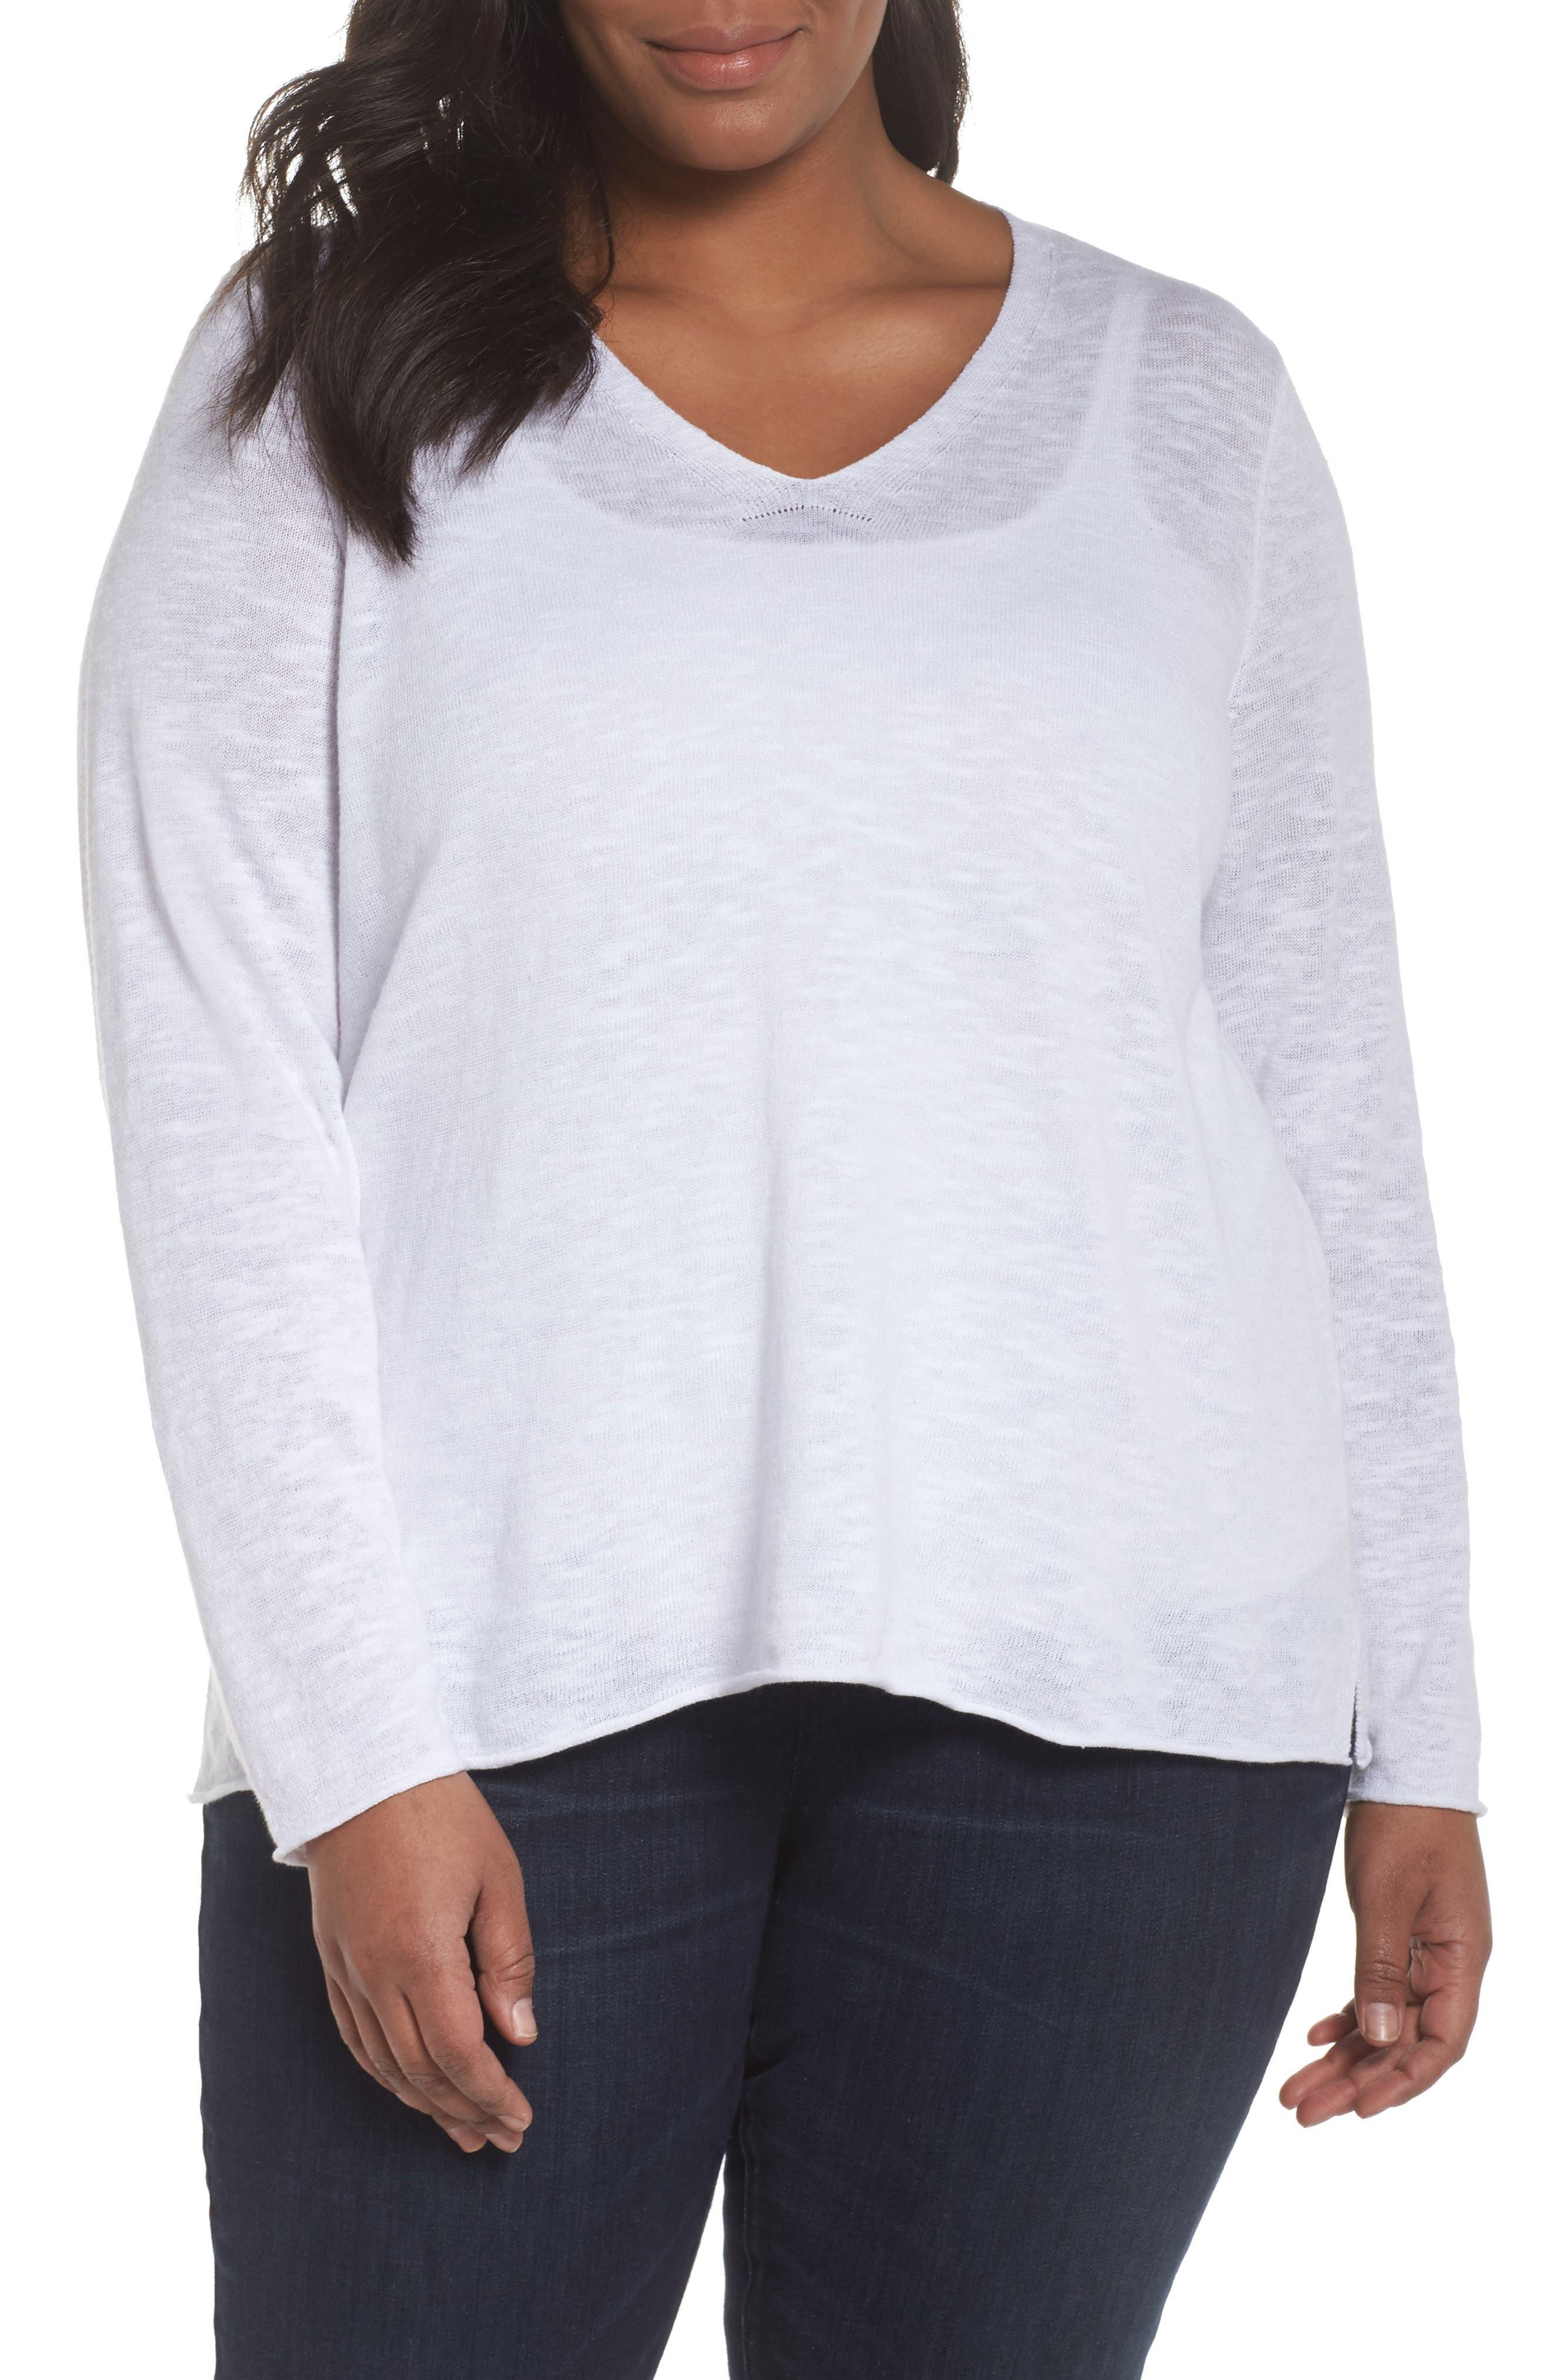 Boxy Organic Linen & Cotton Sweater,                             Main thumbnail 1, color,                             100